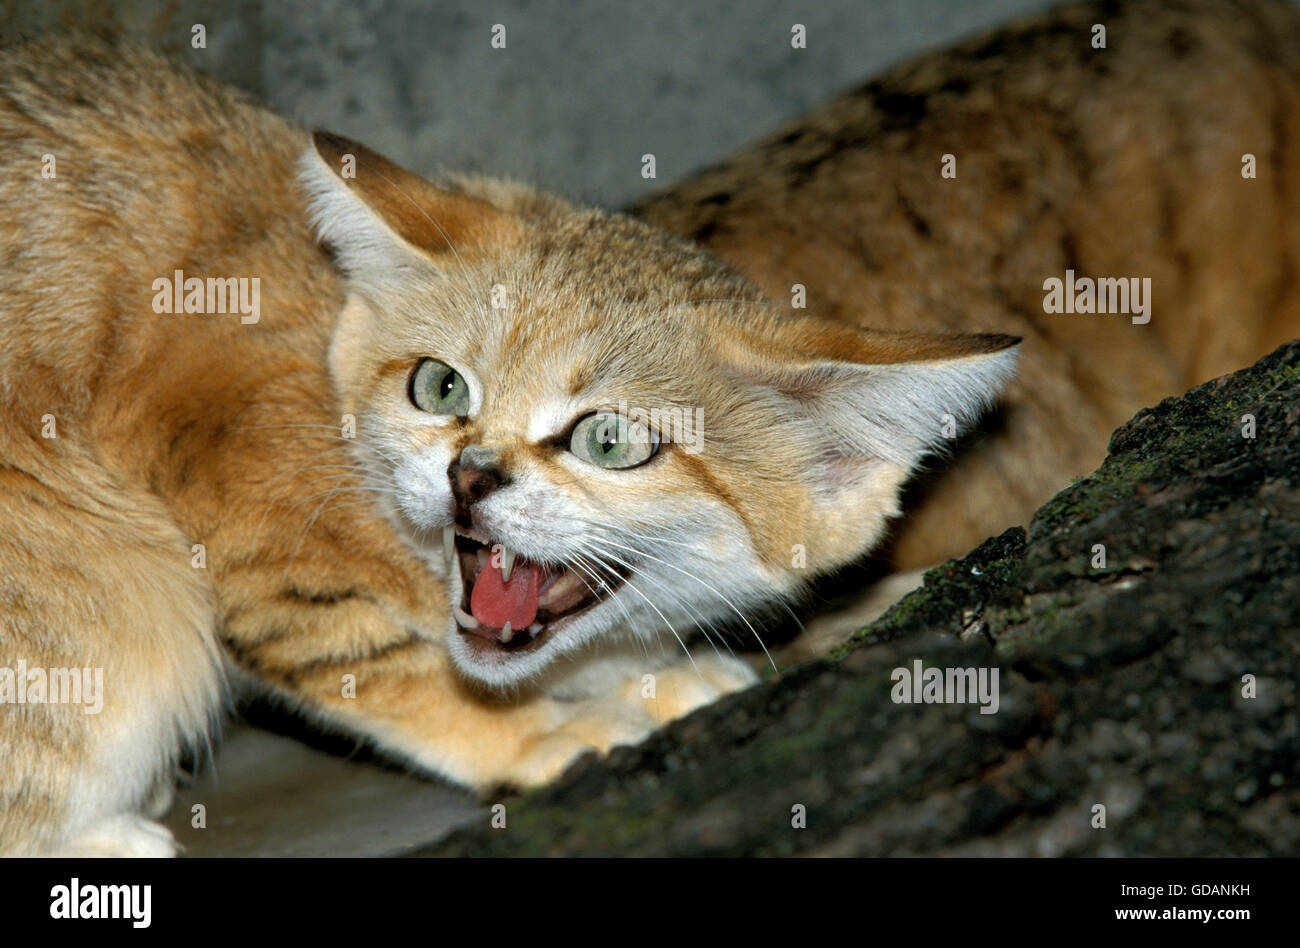 SAND CAT felis margarita, ADULT SNARLING - Stock Image